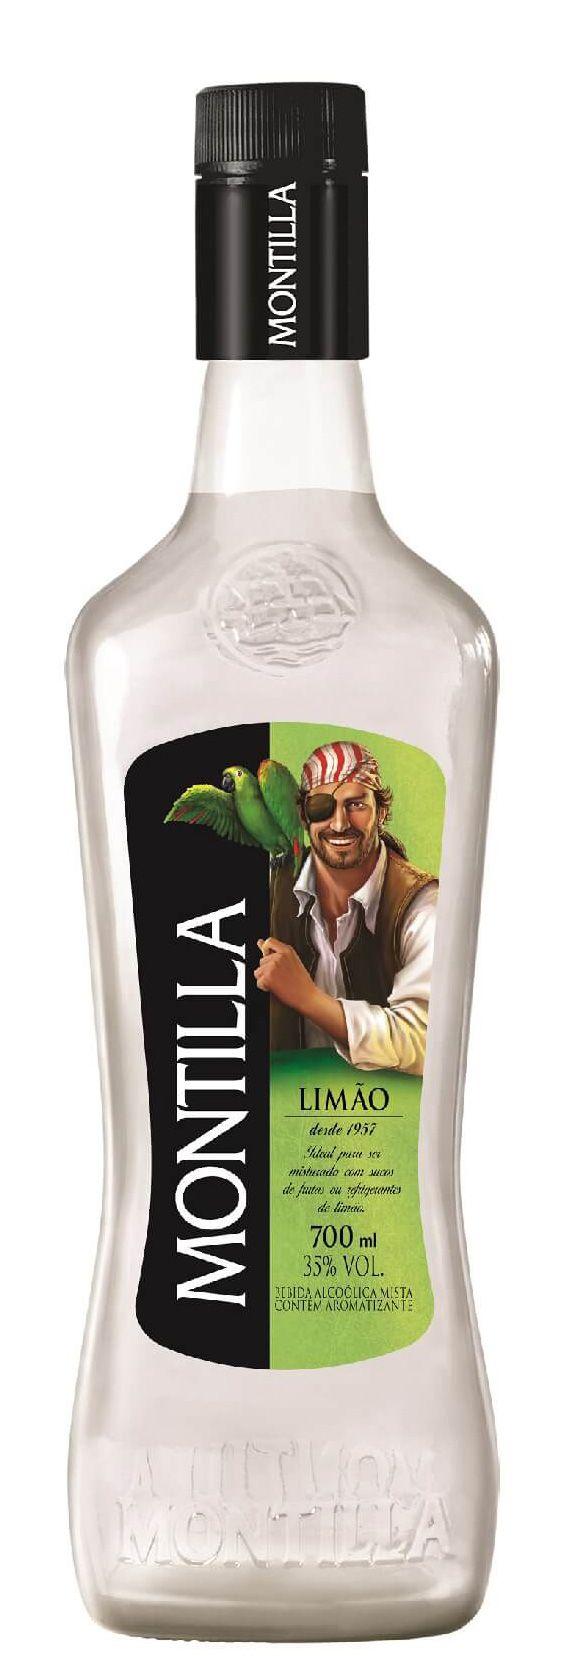 Montilla Limão Rum Nacional 700ml